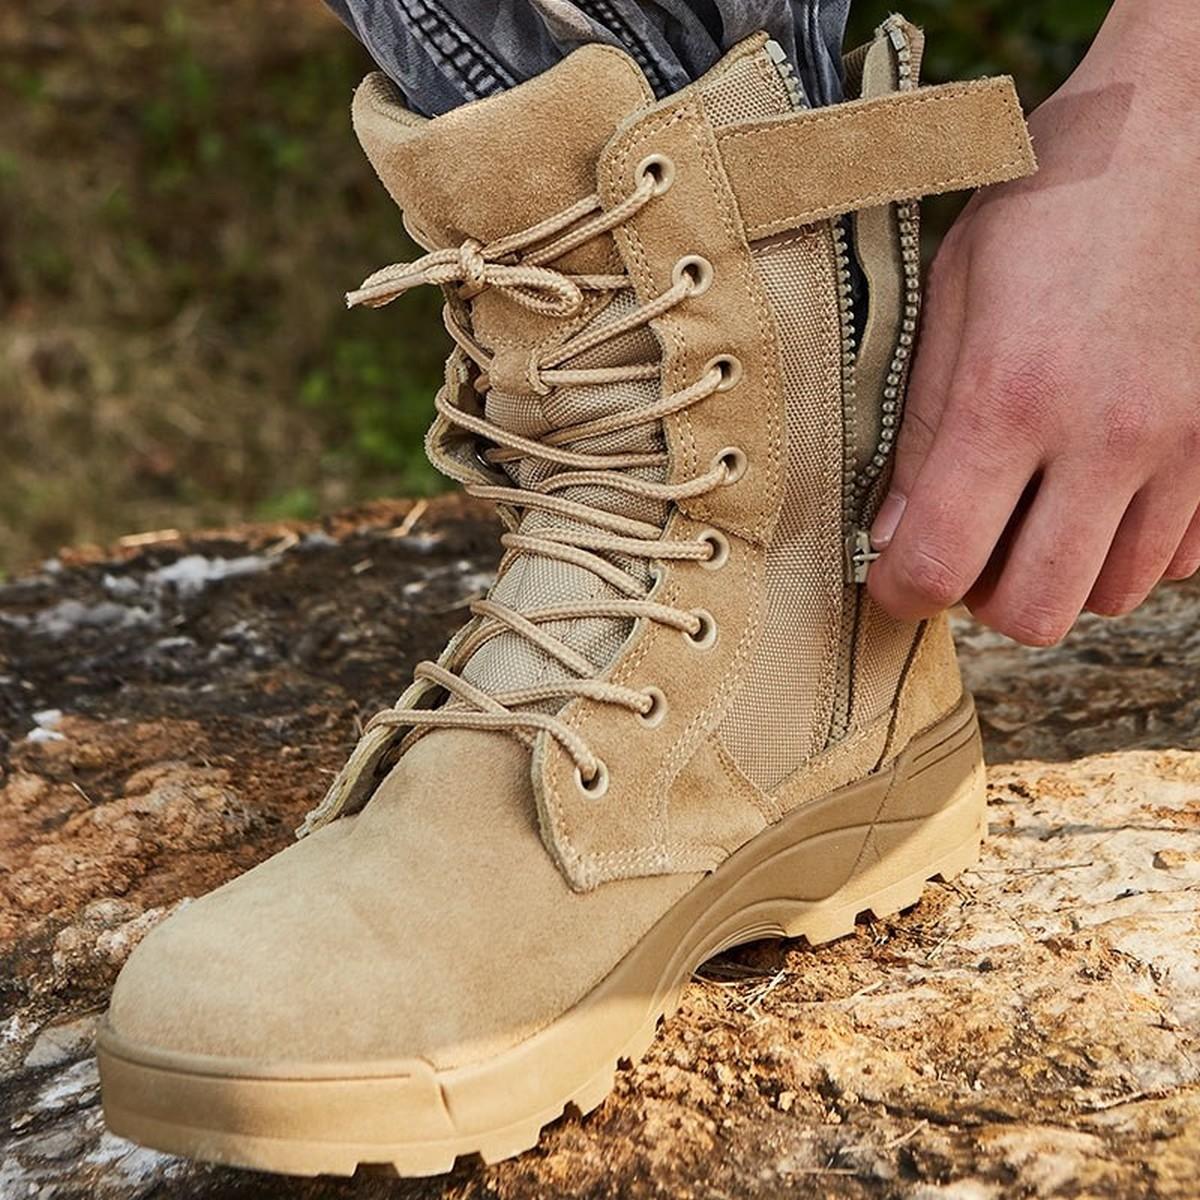 orignal Sawat army commando shoes Khaaki Colored Commando Trekking Boots for men & Boys